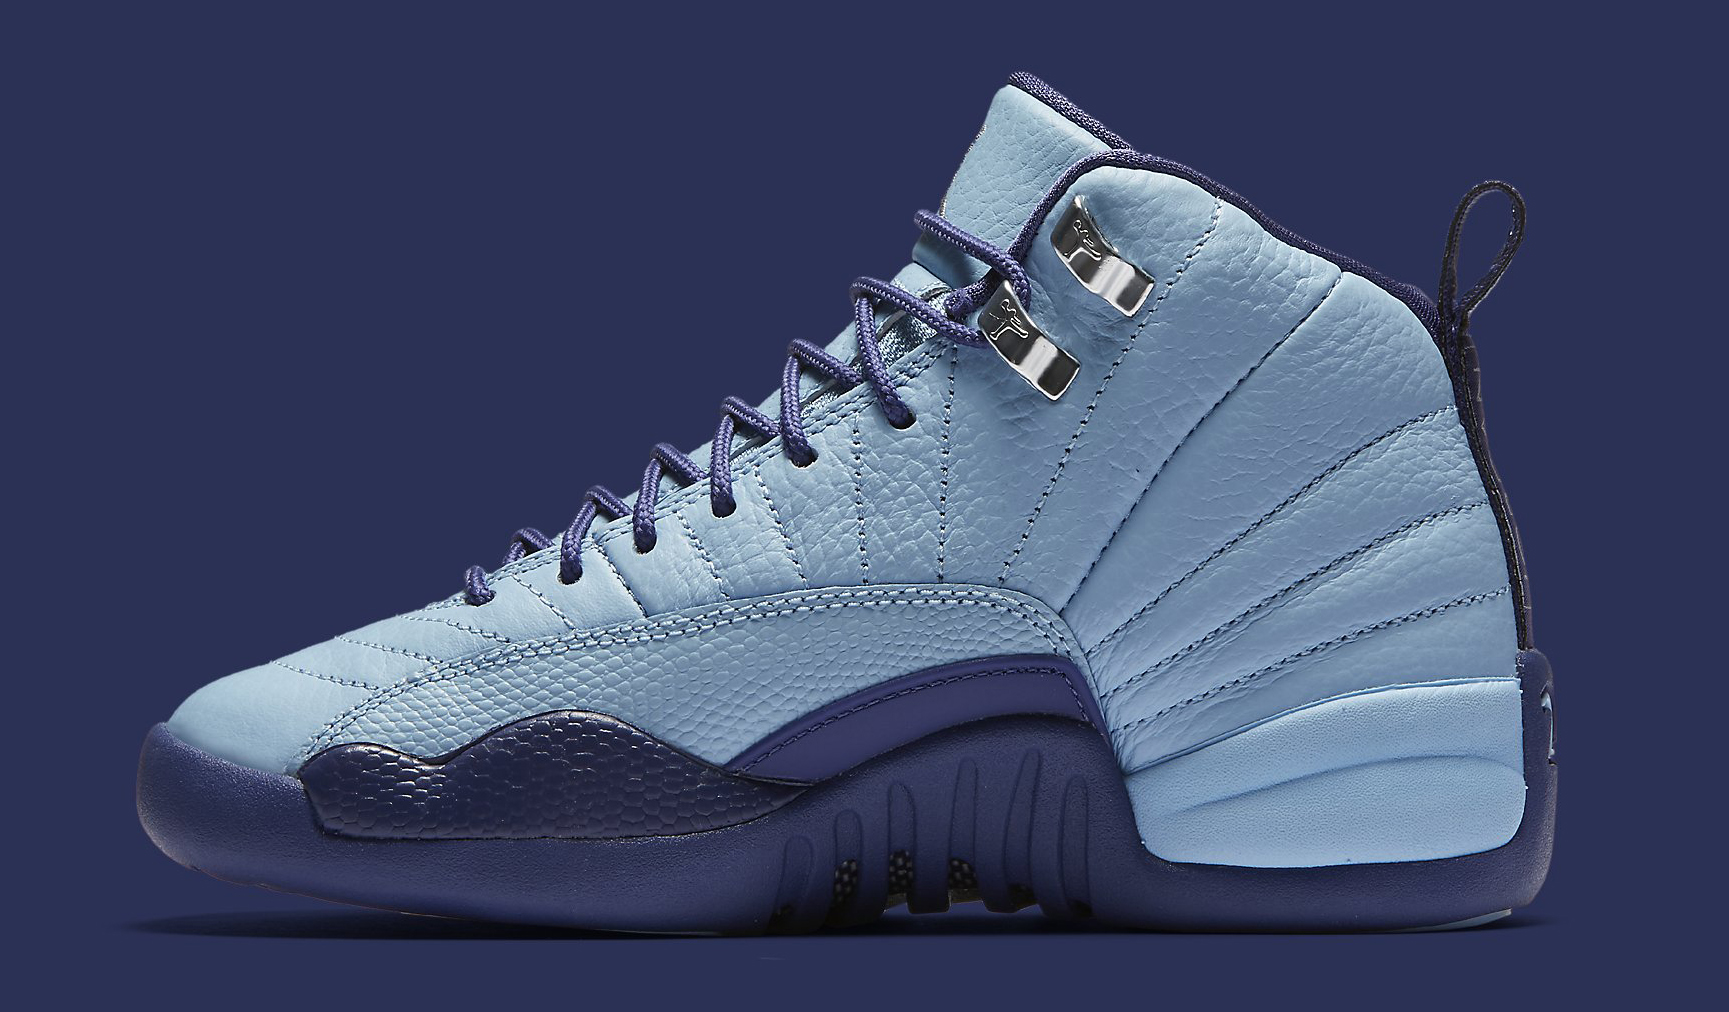 Jordan 12 release dates in Sydney